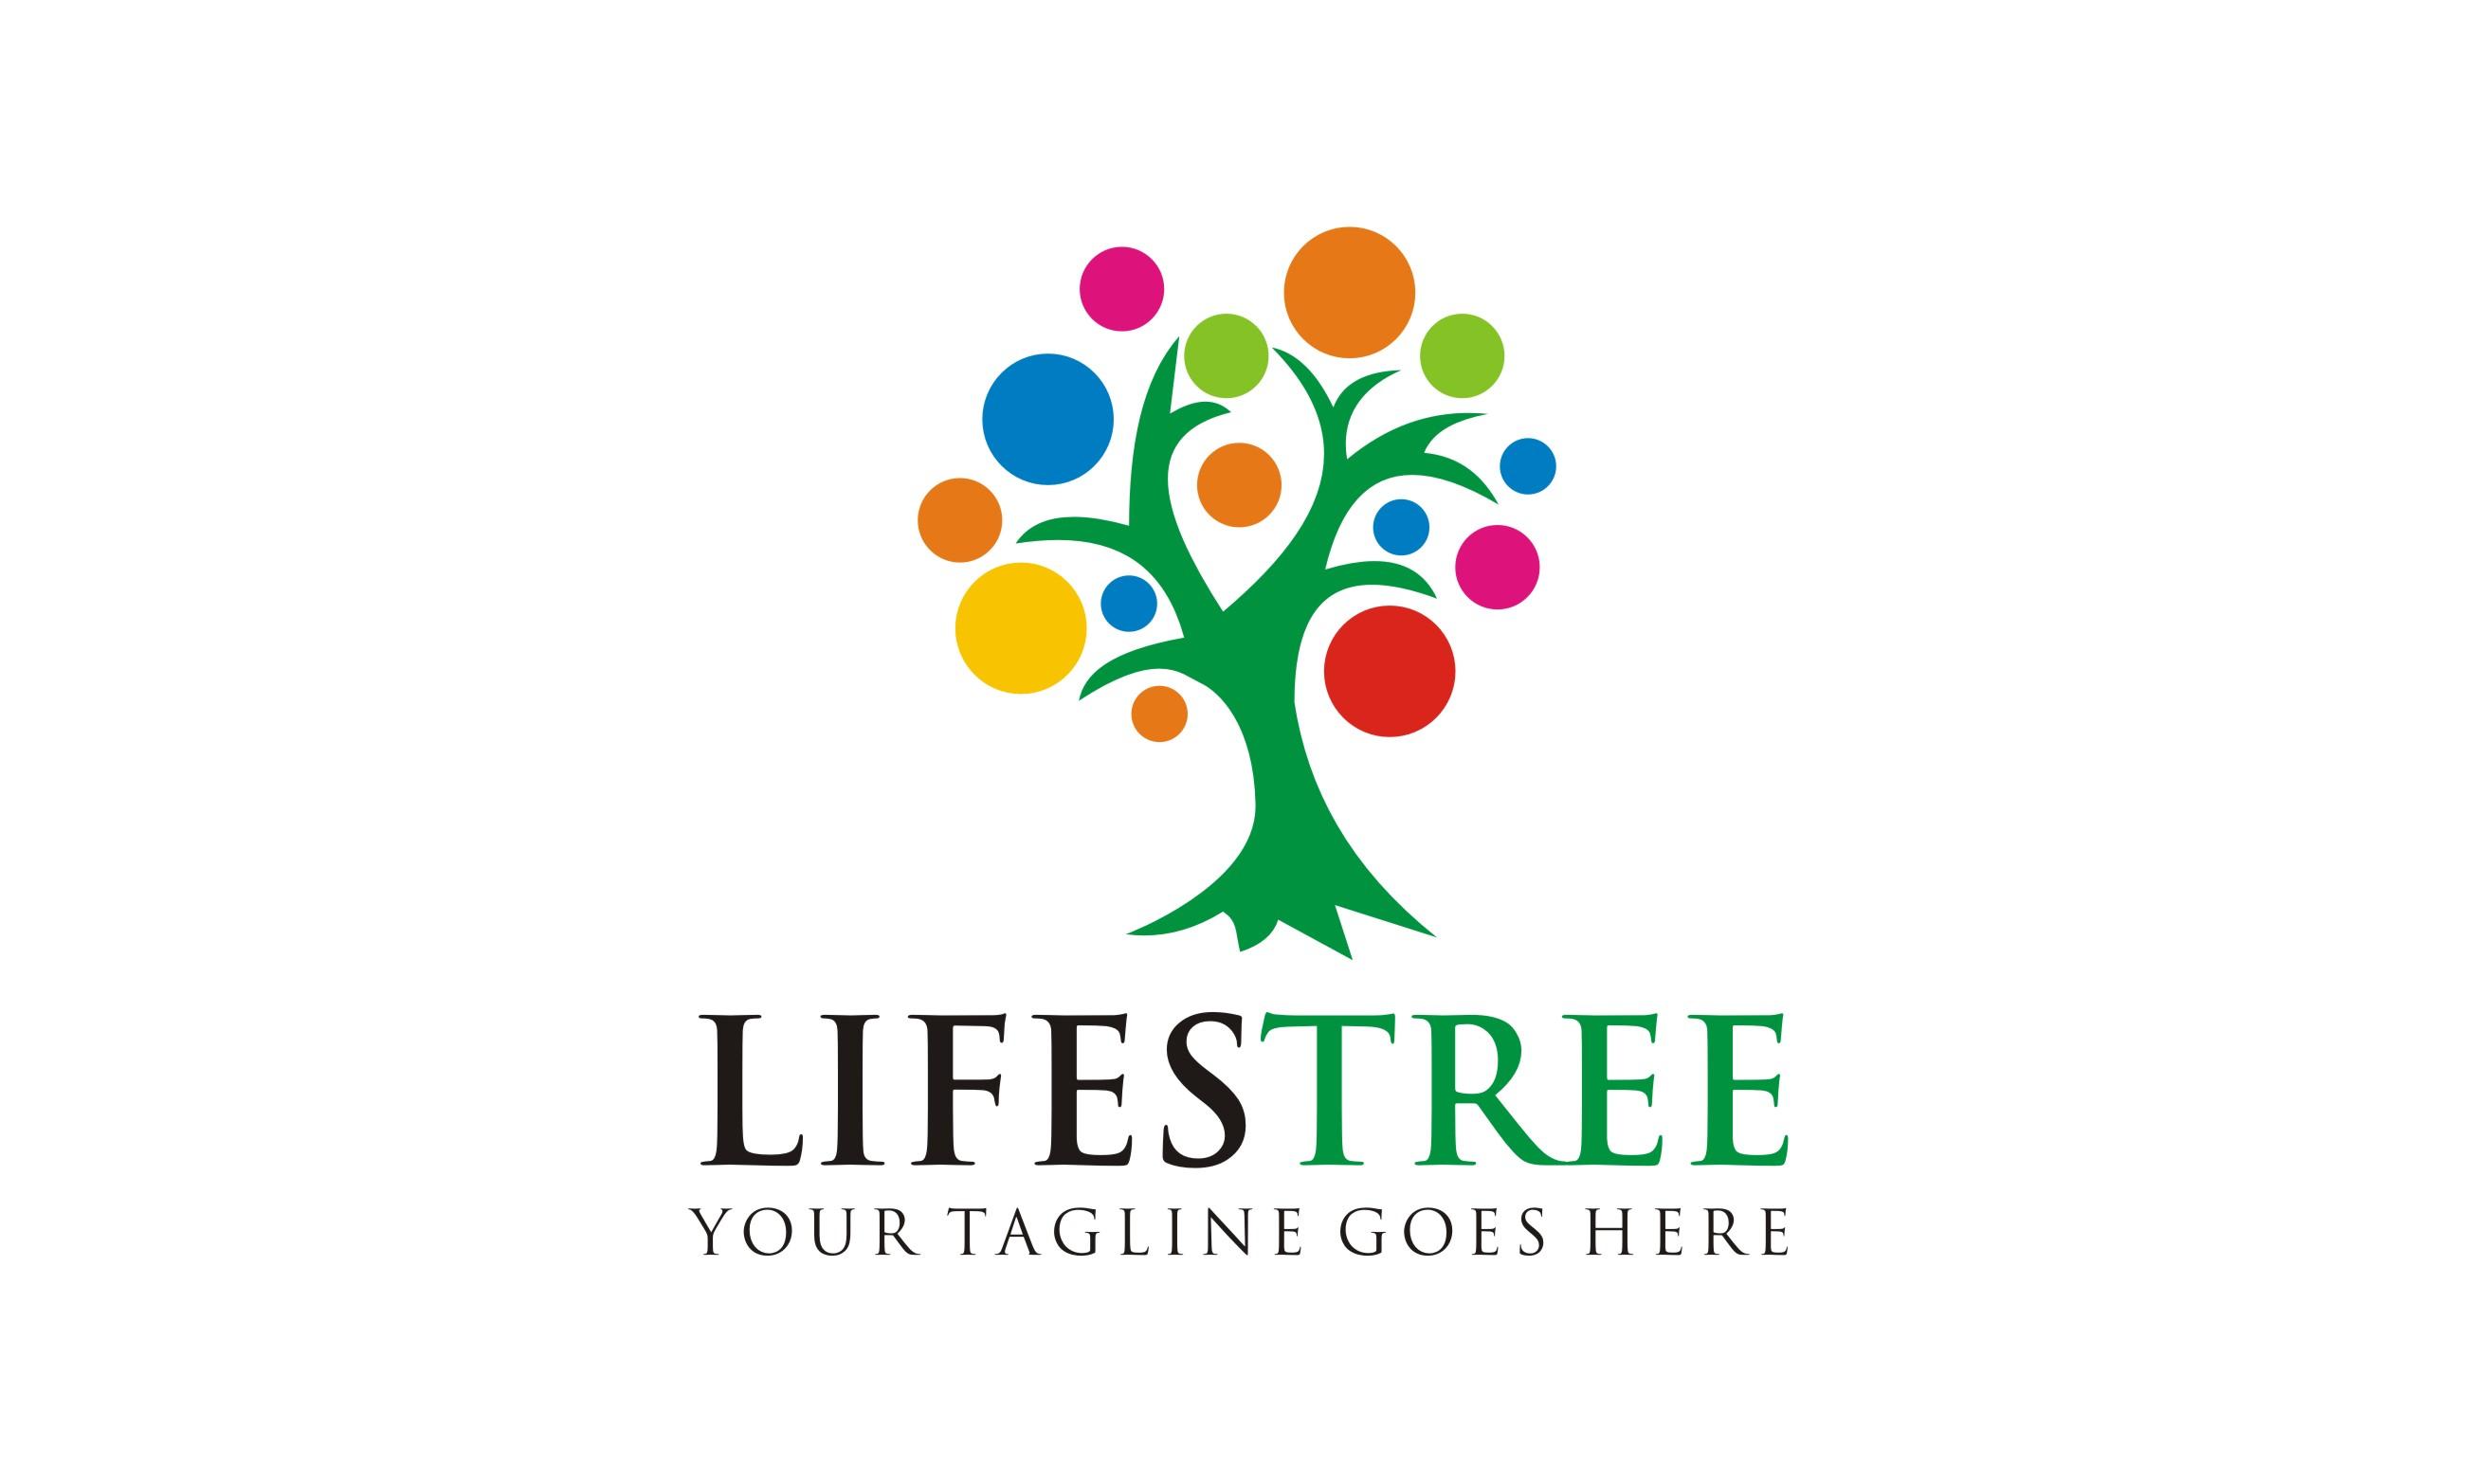 LIFES TREE LOGO